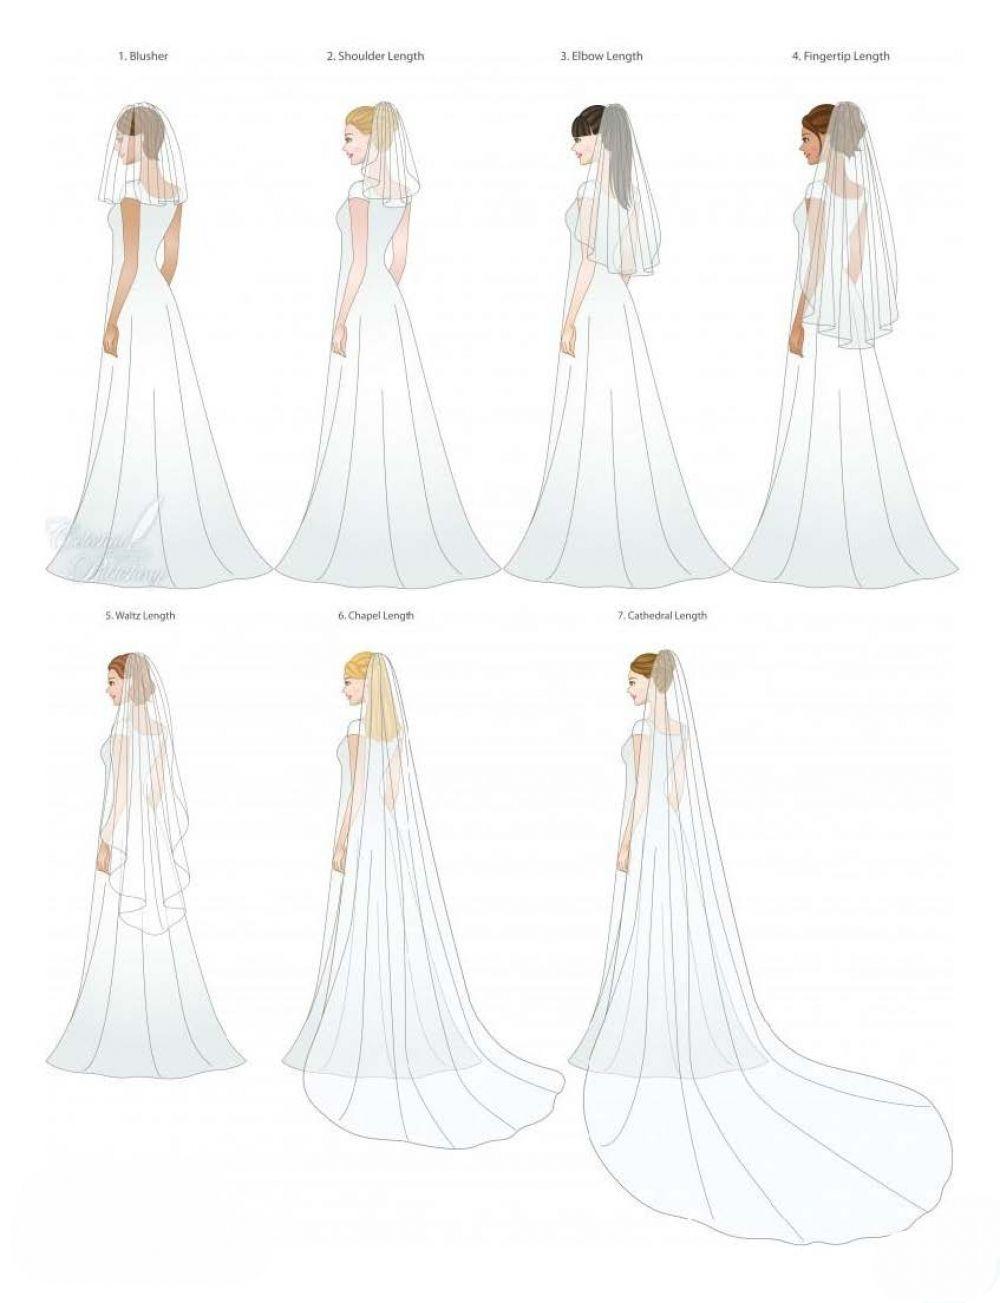 Custom Made Bridal Veils Theabsolute Store Wedding Attire Veil Length Bride